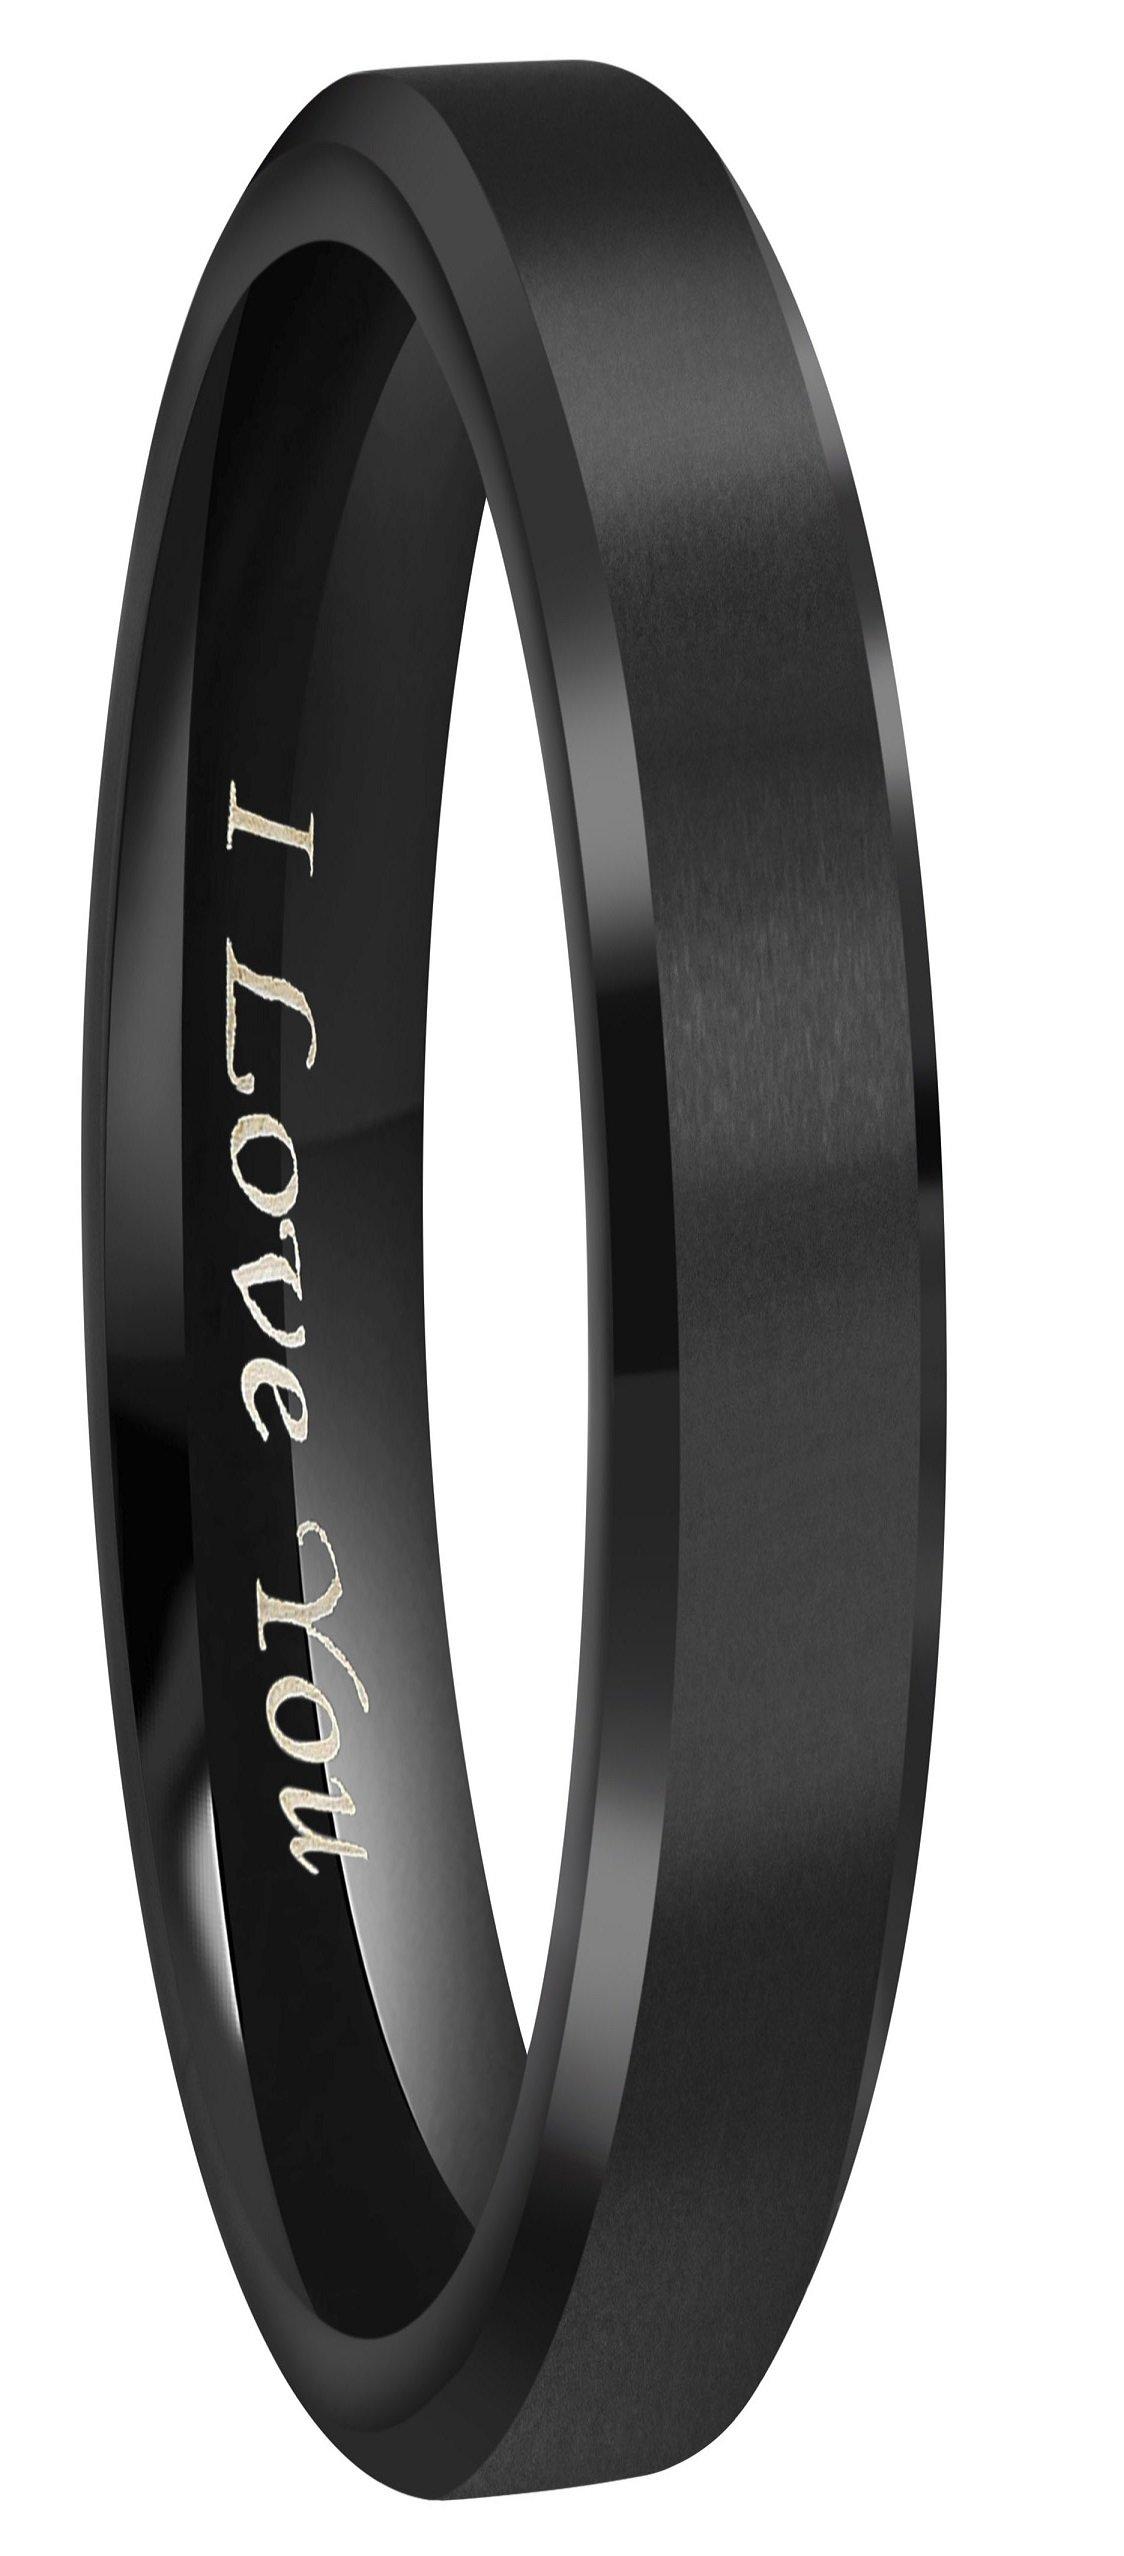 4mm/6mm/8mm Black Titanium Wedding Couple Bands Rings Men Women Matte Finish Beveled Edges Engraved ''I Love You'' Comfort Fit Size 4 To 16 (4mm,9)